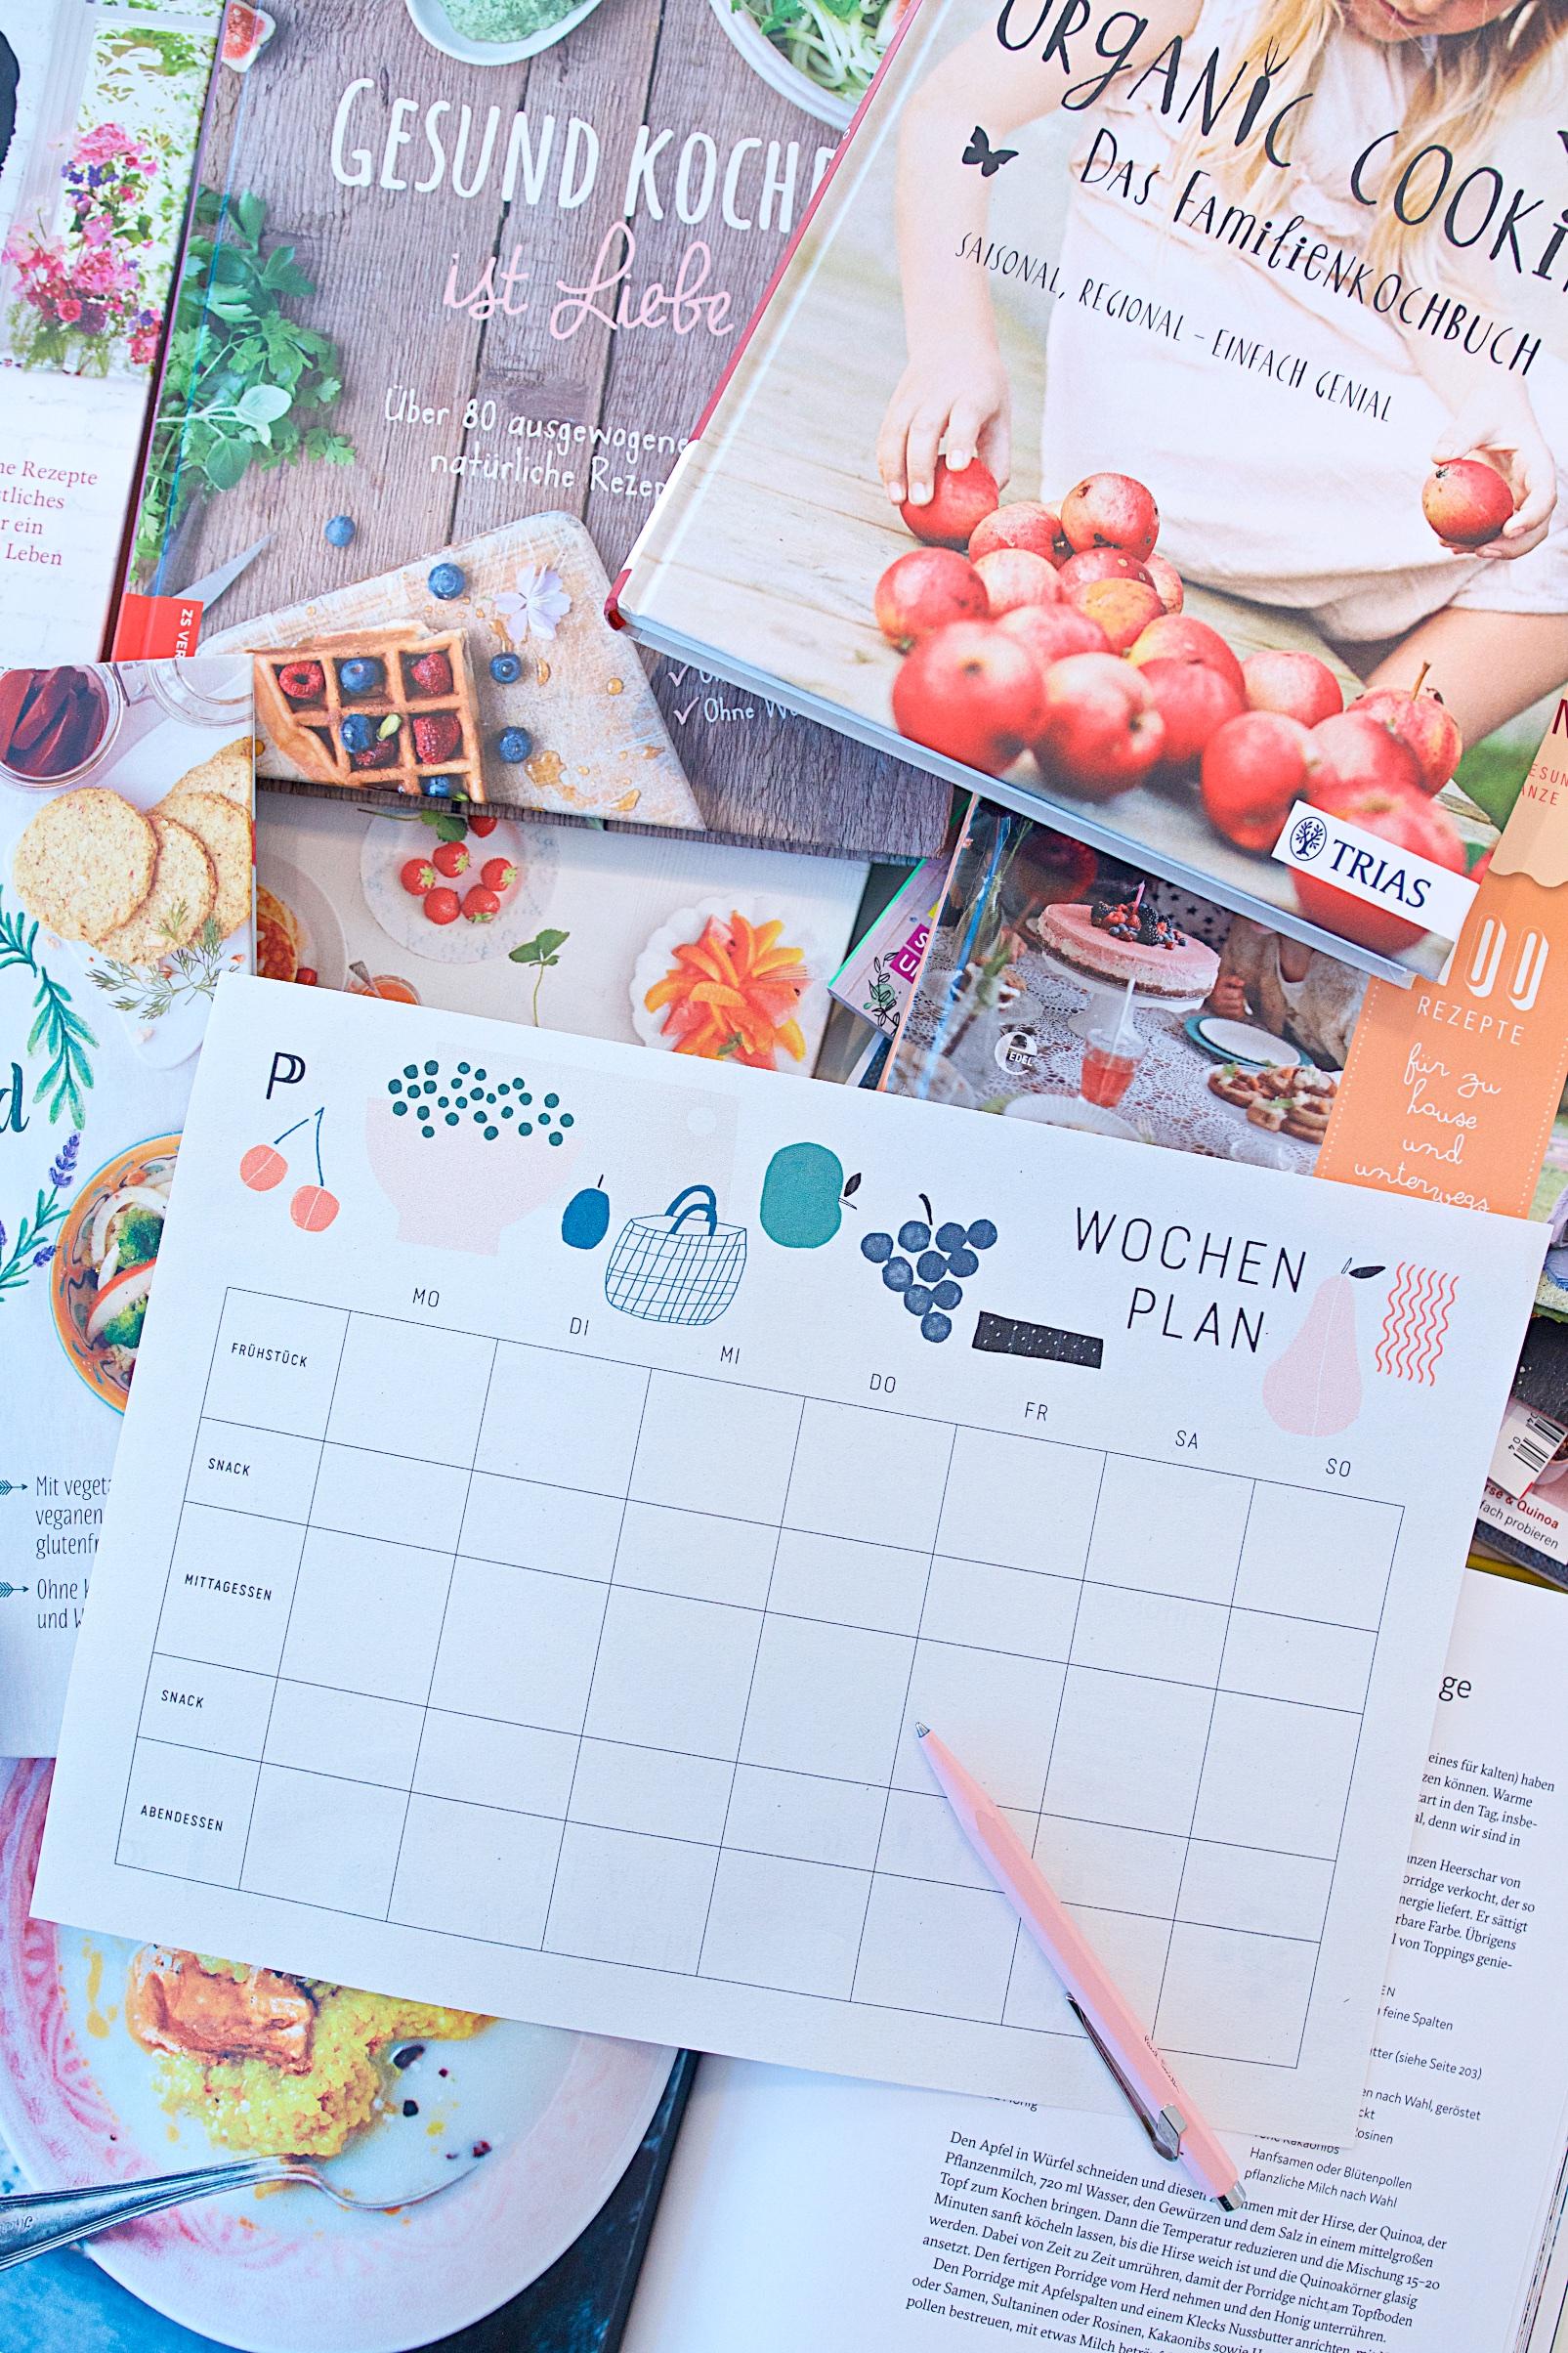 Wochenplan Essensplan Free Printable